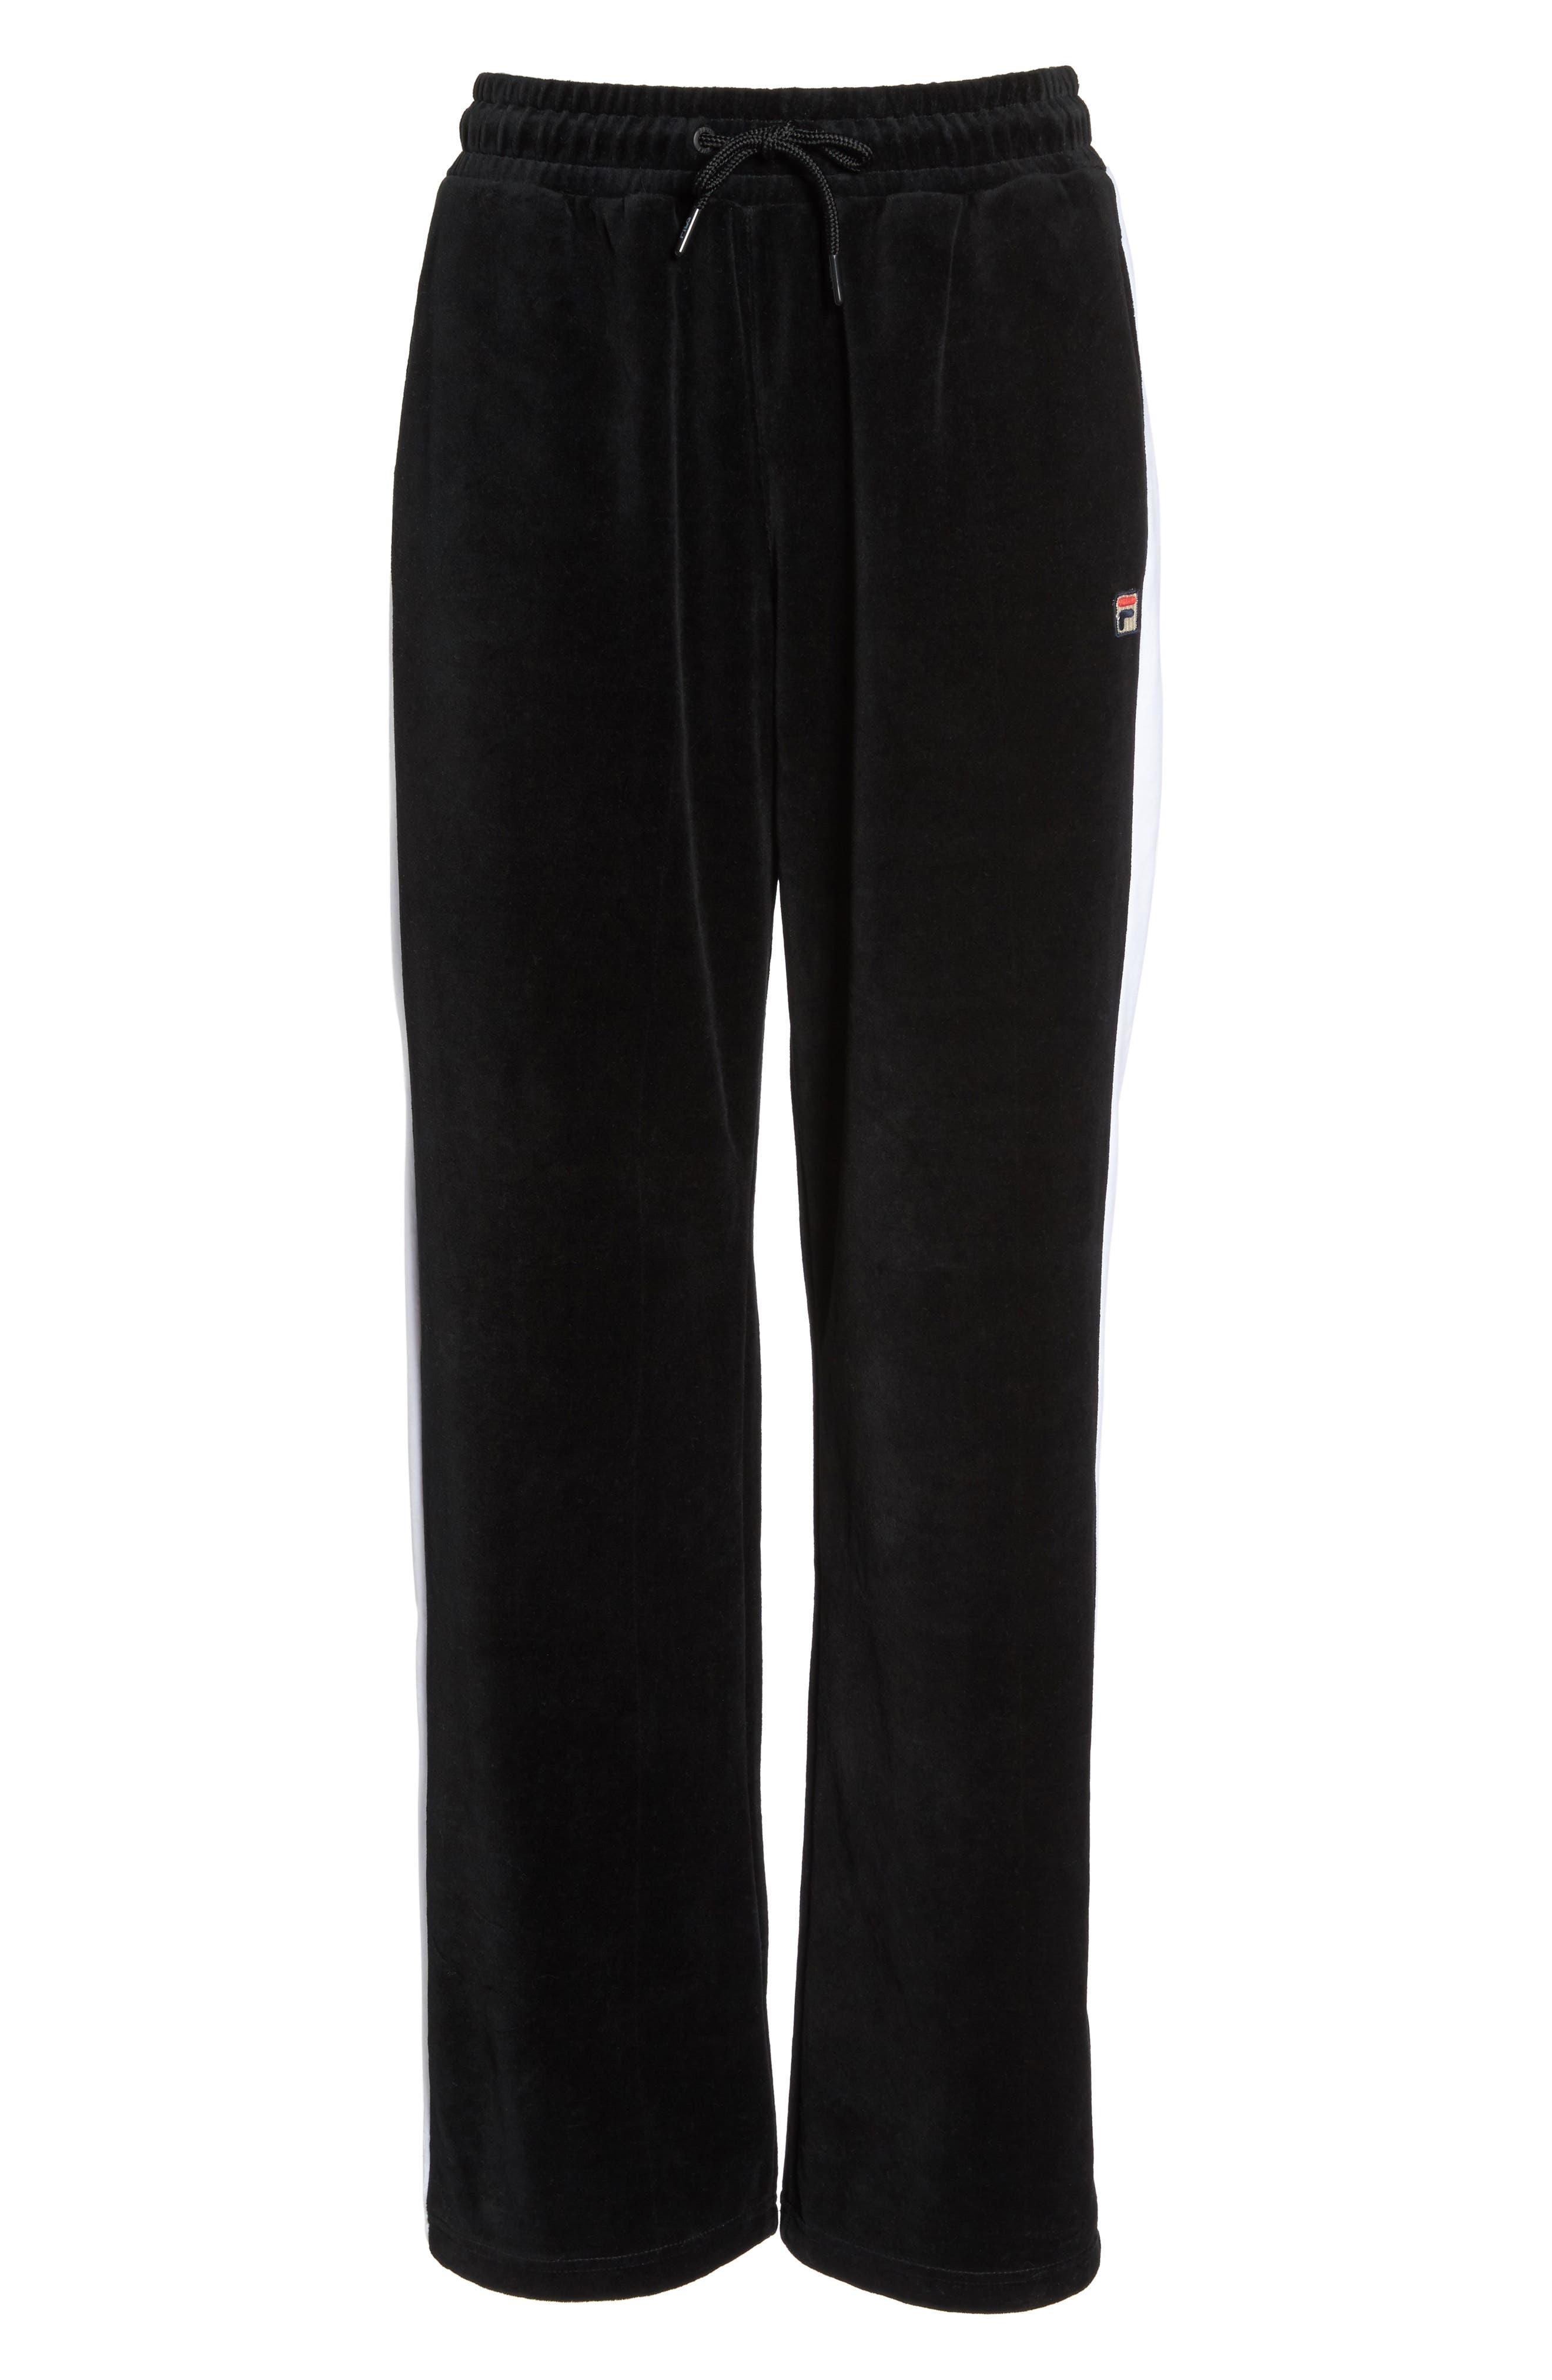 Bonnie Velour Track Pants,                             Alternate thumbnail 7, color,                             Black/ White